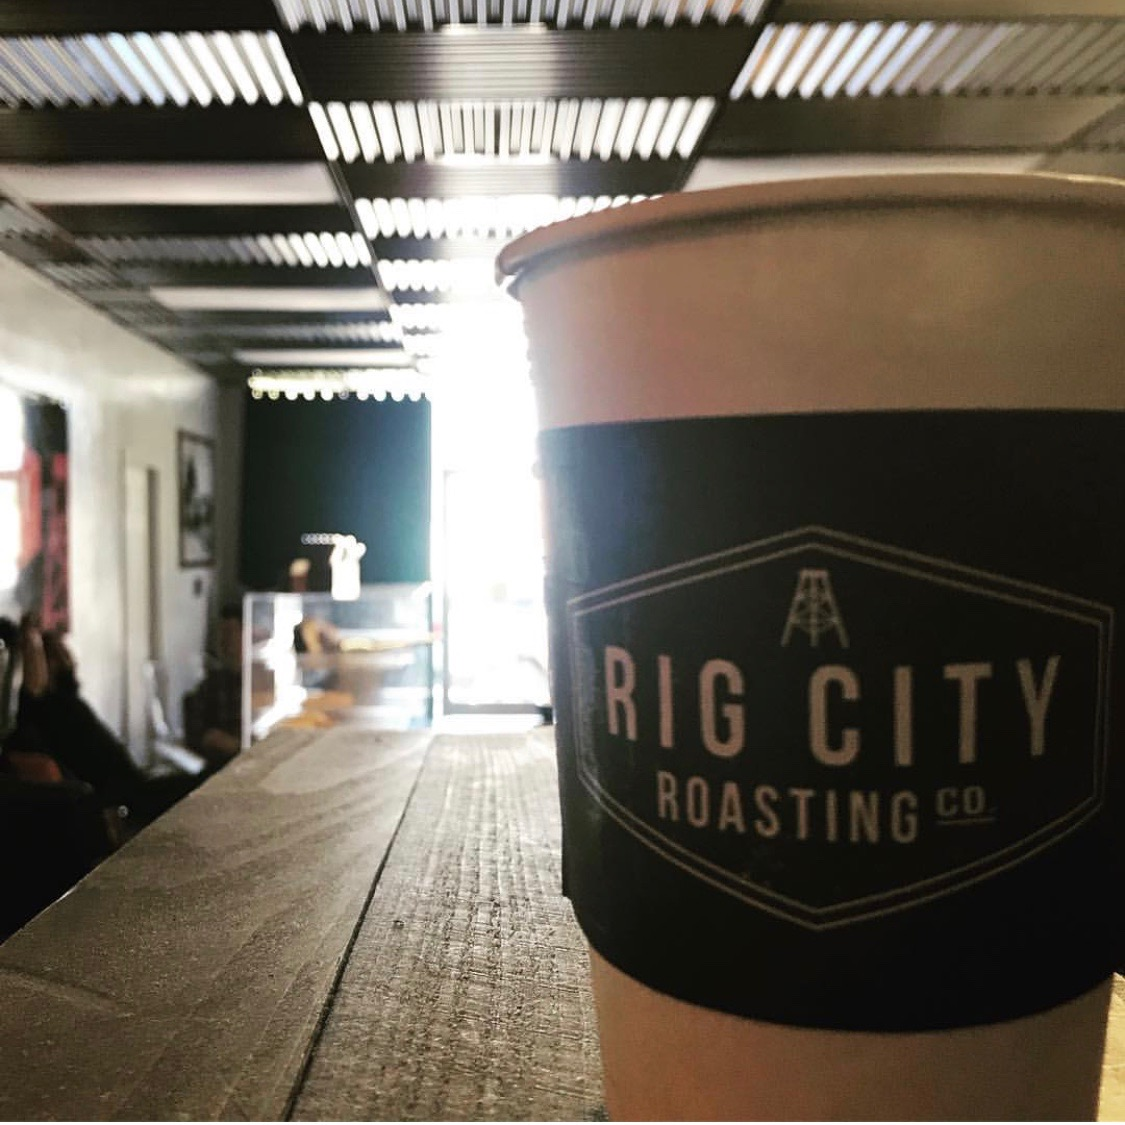 Photo via Rig City Roasting Co